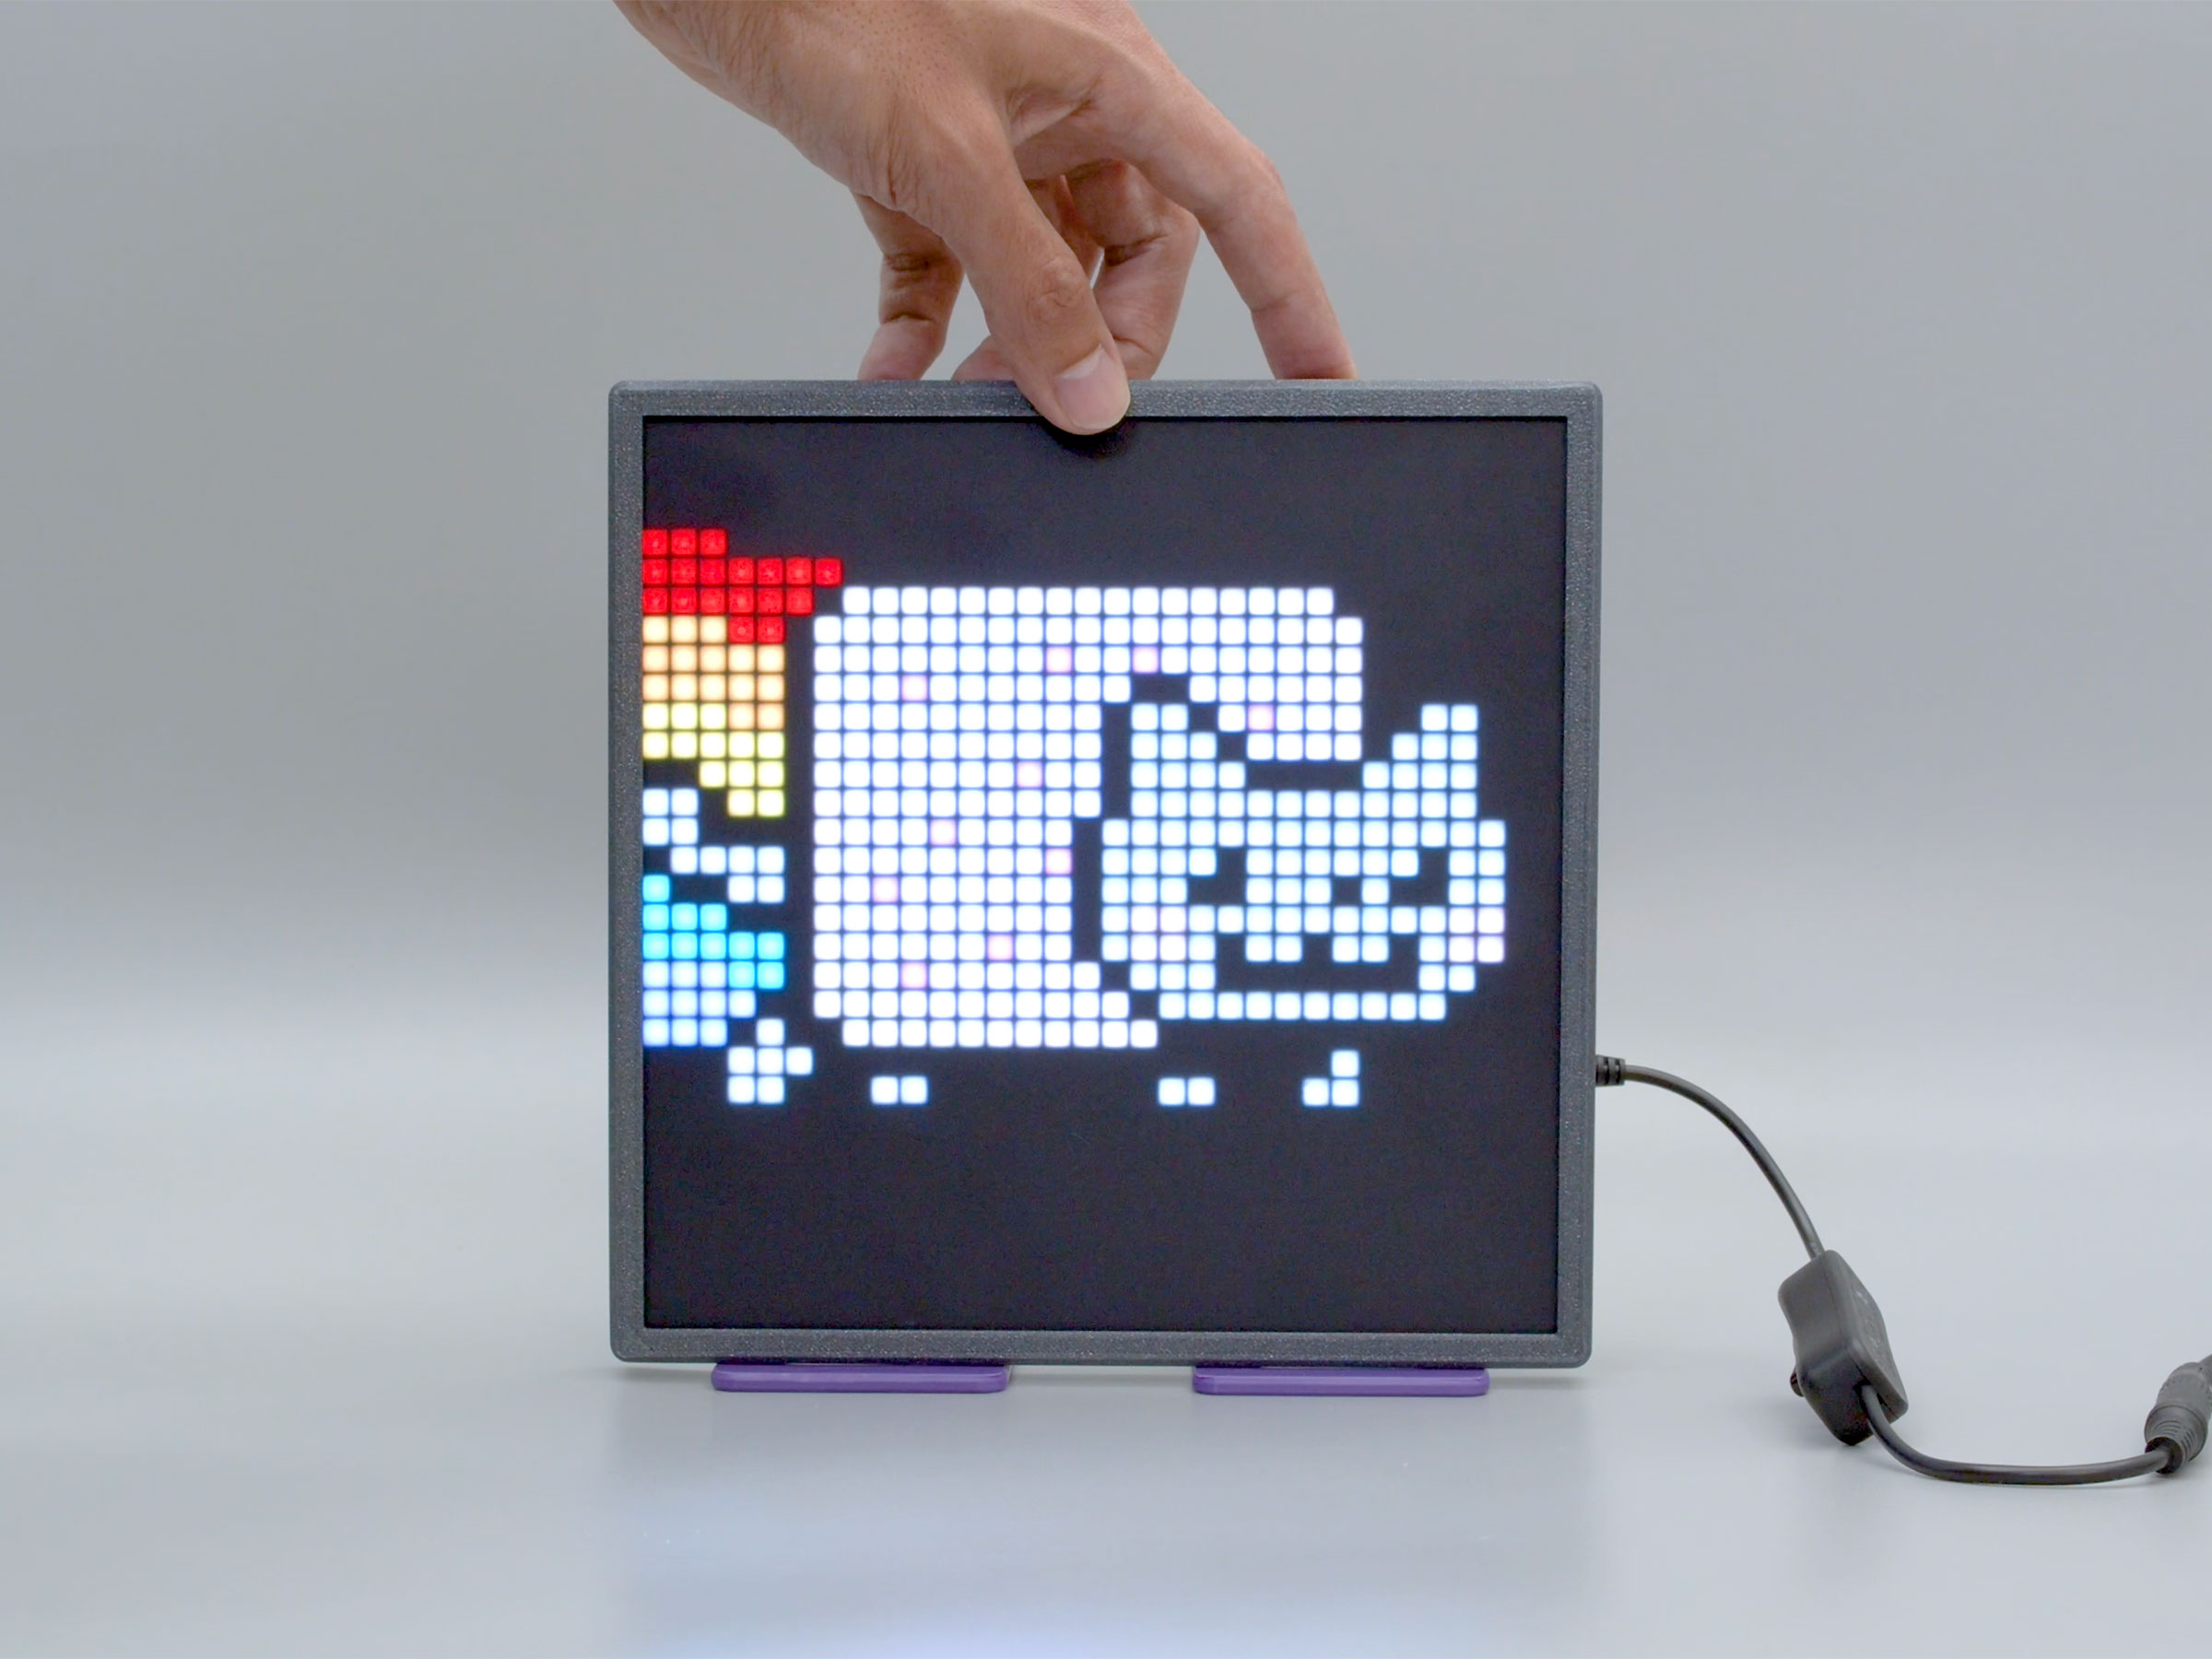 led_matrices_display-hand.jpg